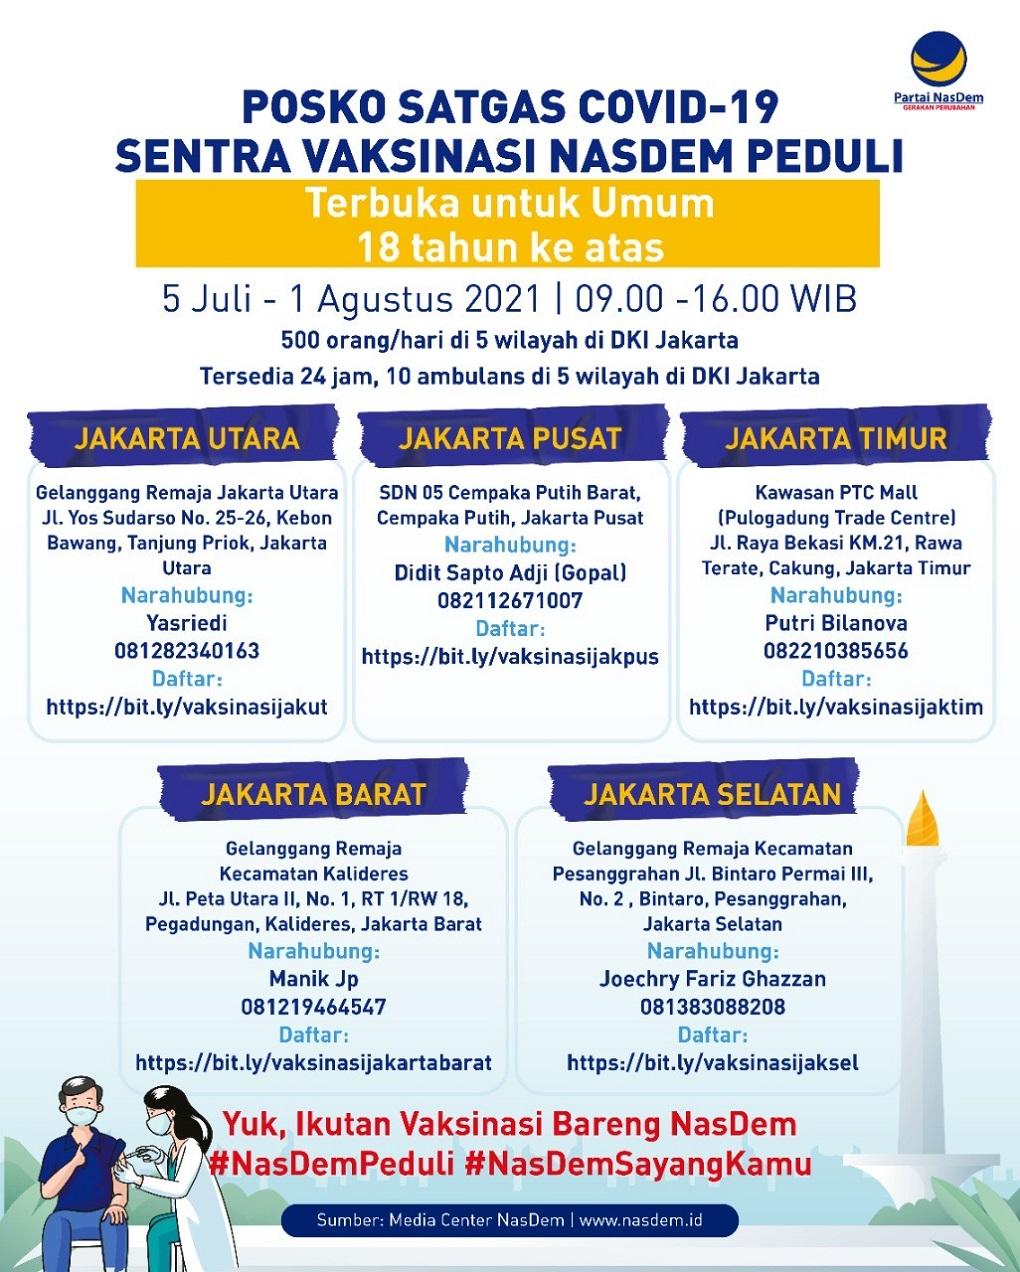 NasDem Targetkan Vaksinasi 1 Juta Penduduk Pulau Jawa